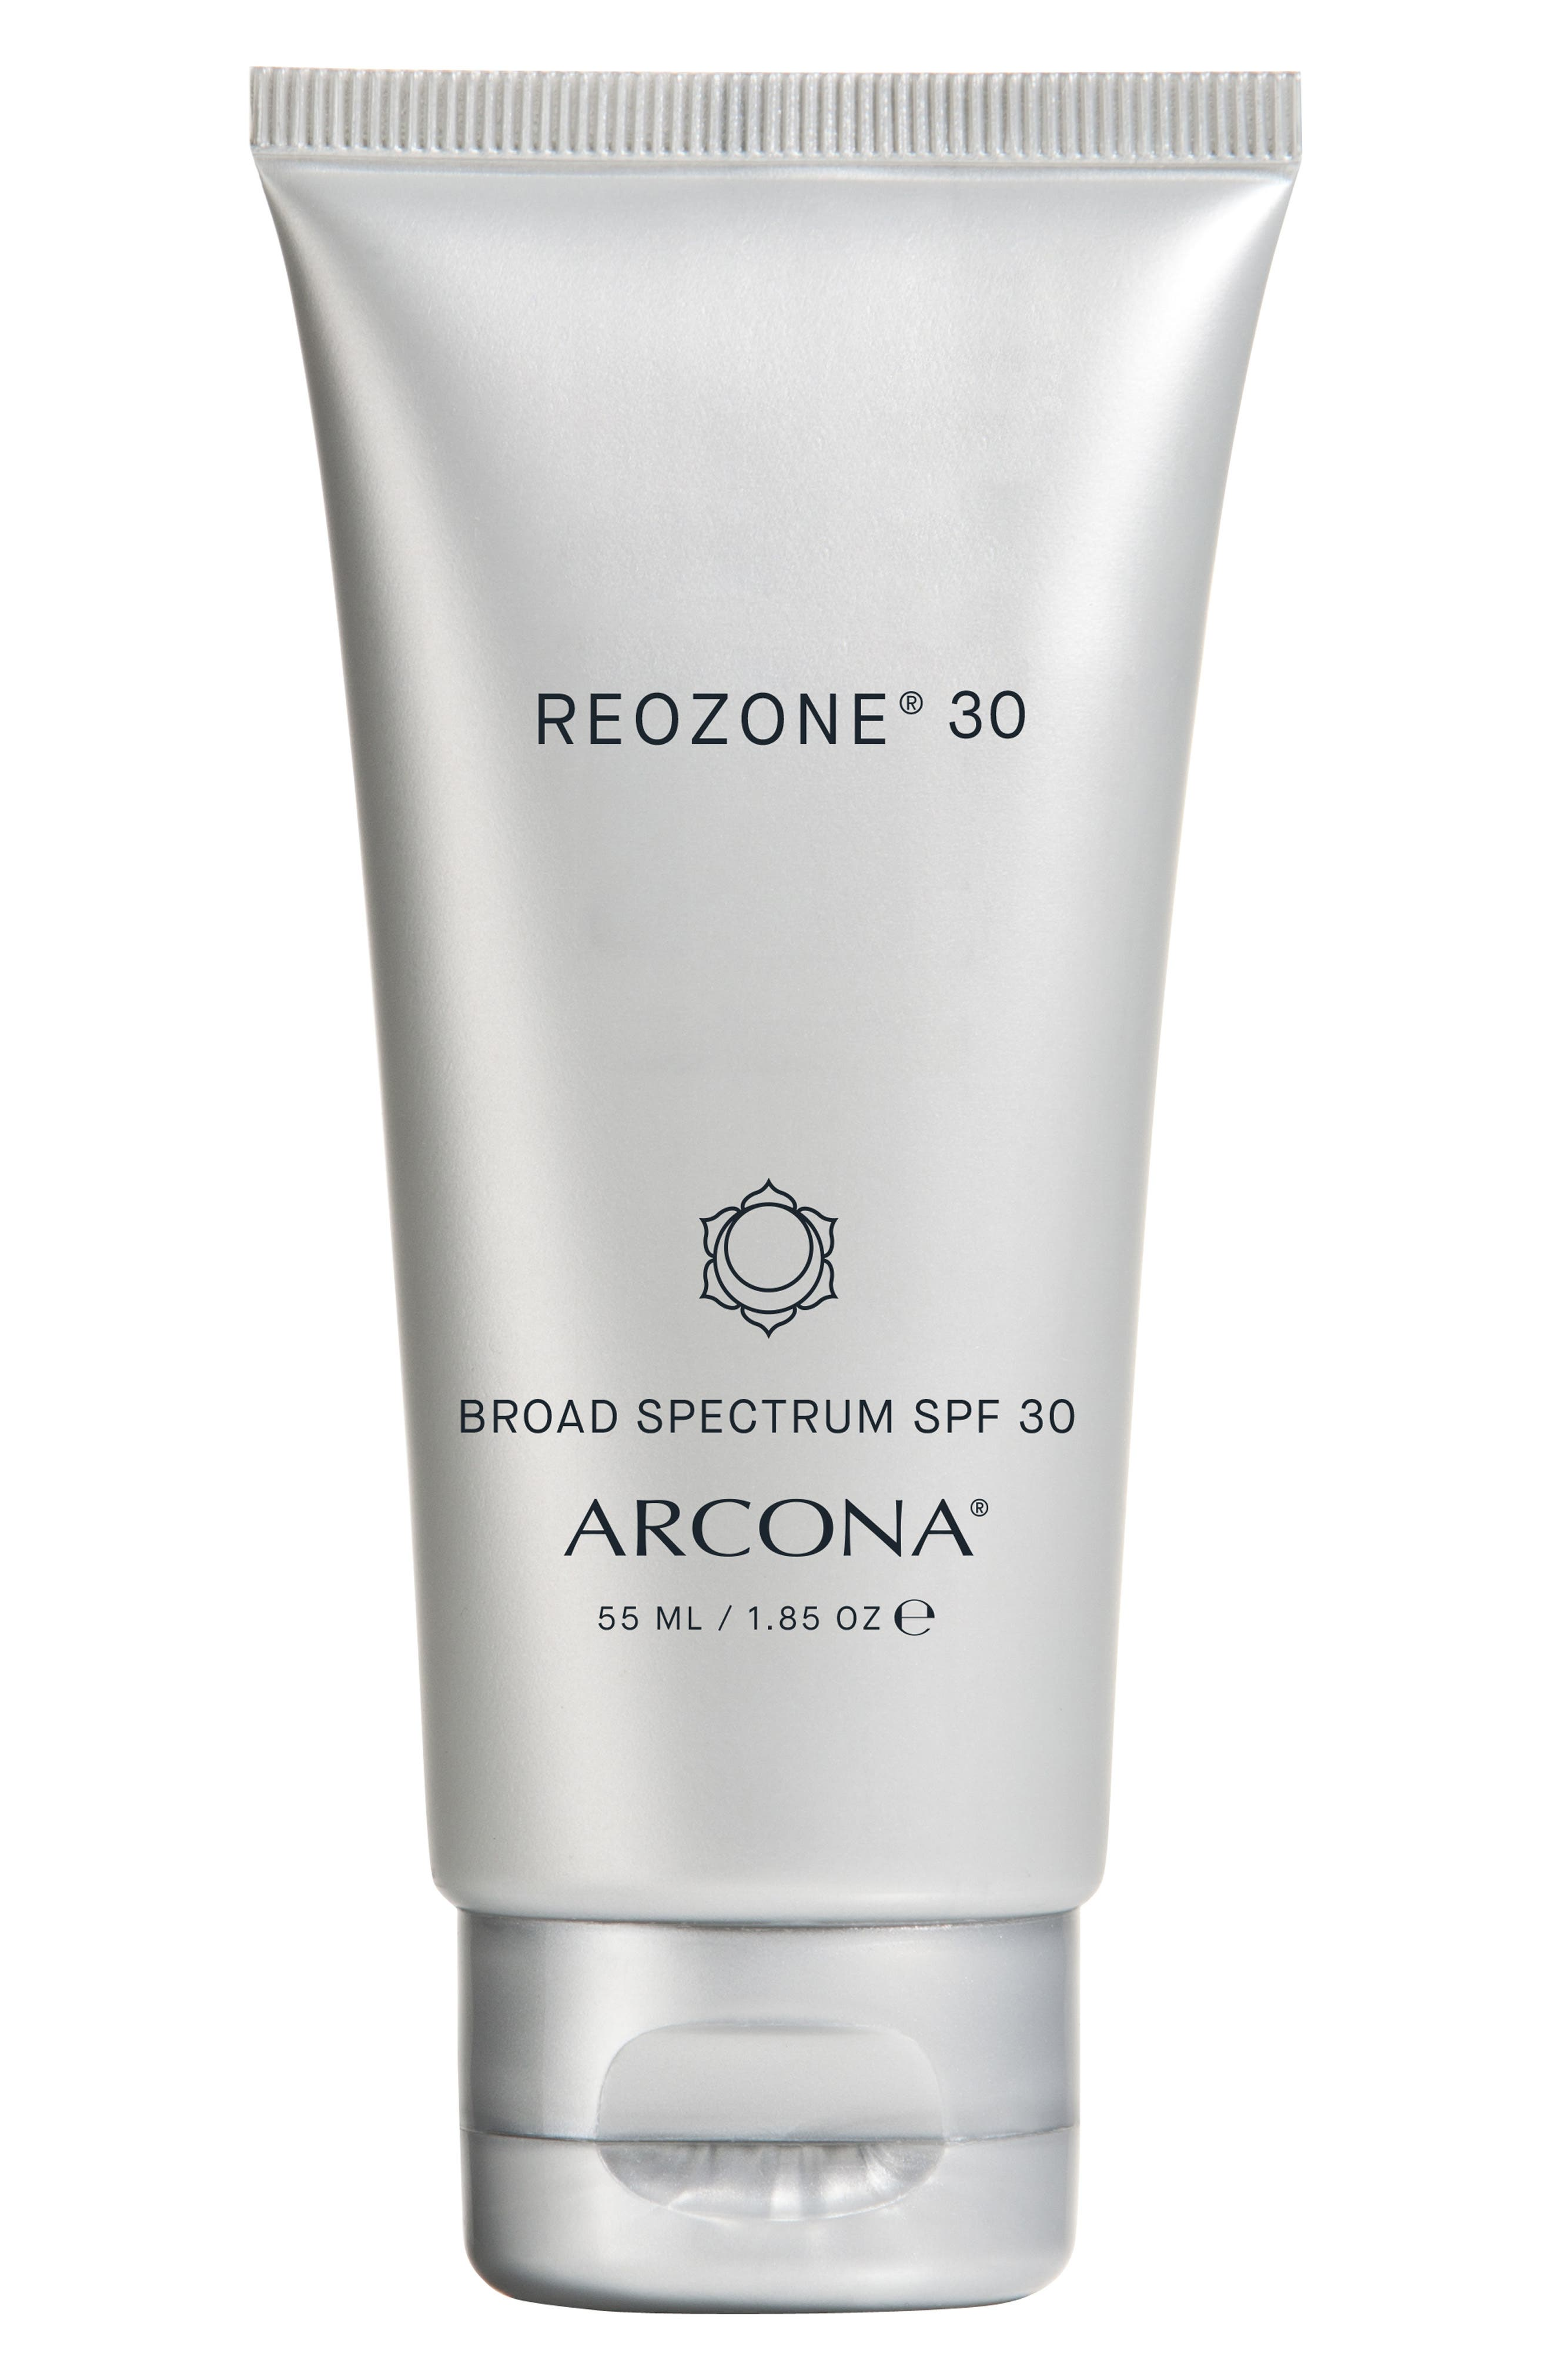 Reozone 30 Broad Spectrum Spf 30 Sunscreen